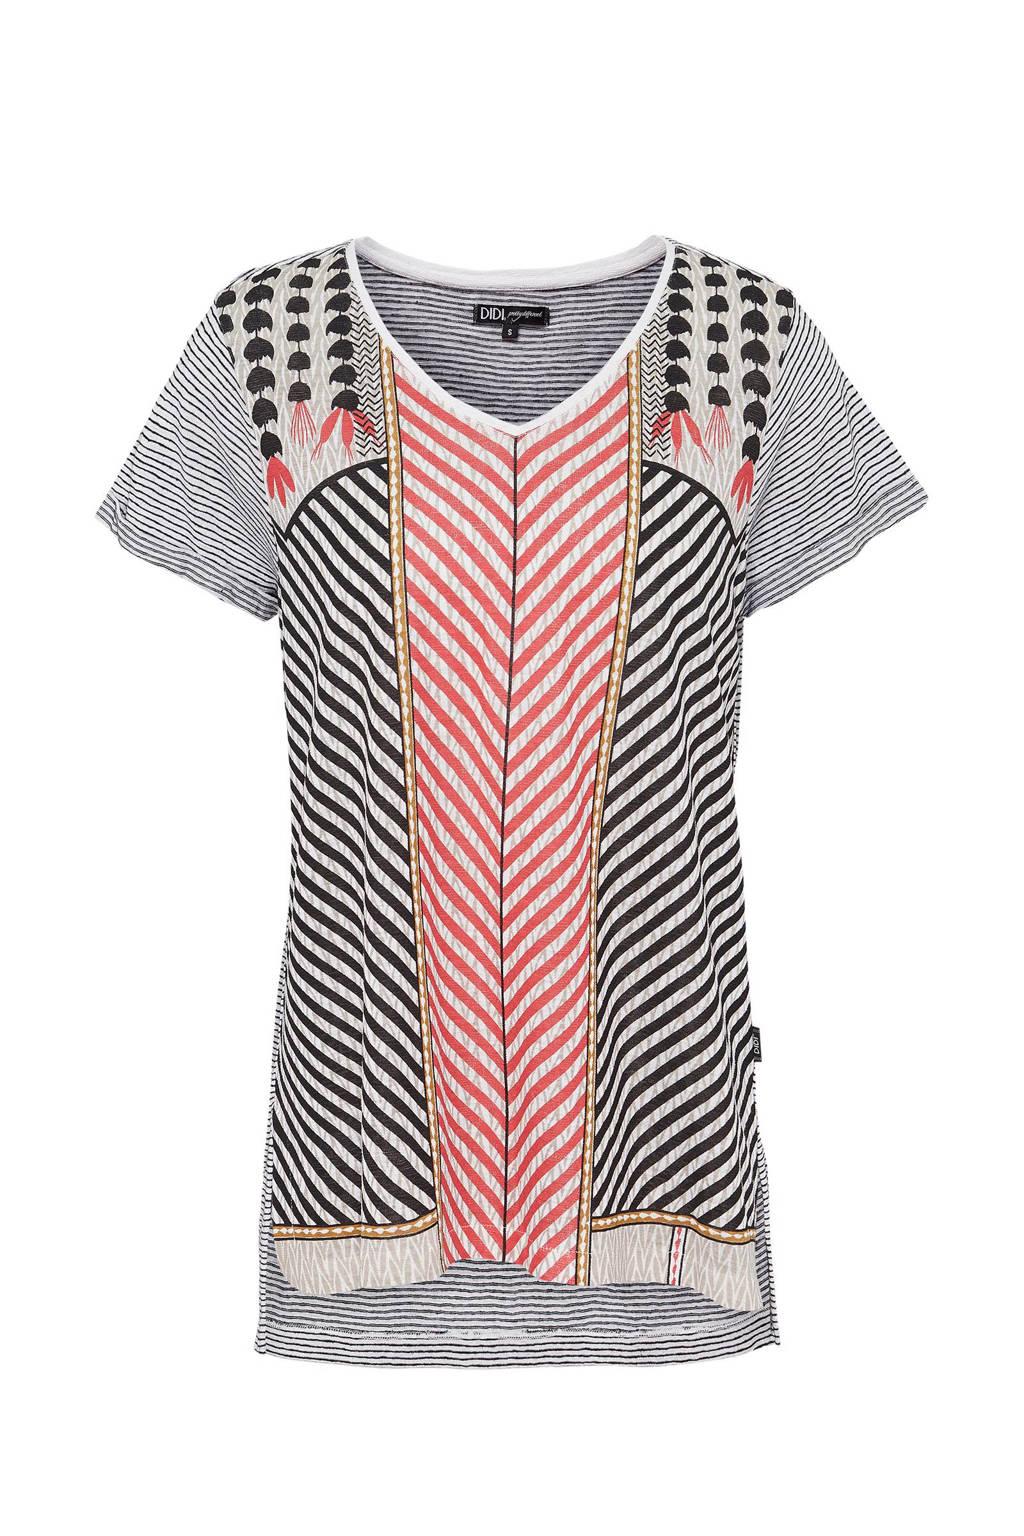 Didi gestreept T-shirt, Zwart/rood/ecru